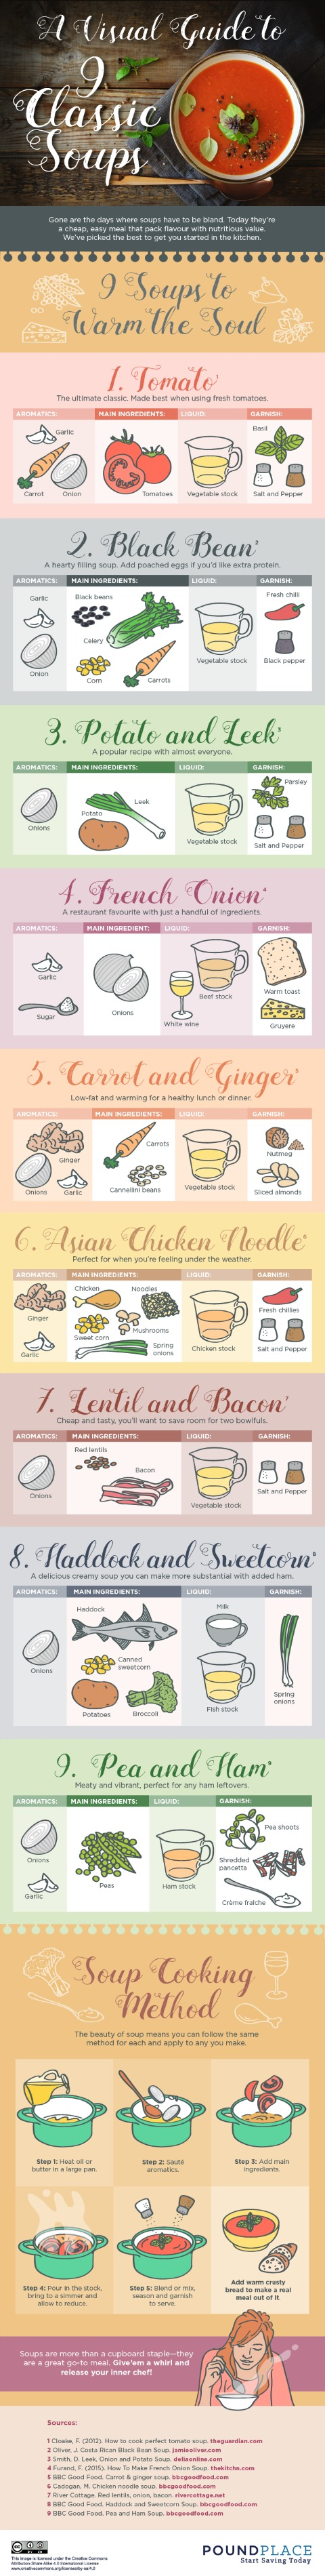 9 Classic Soups